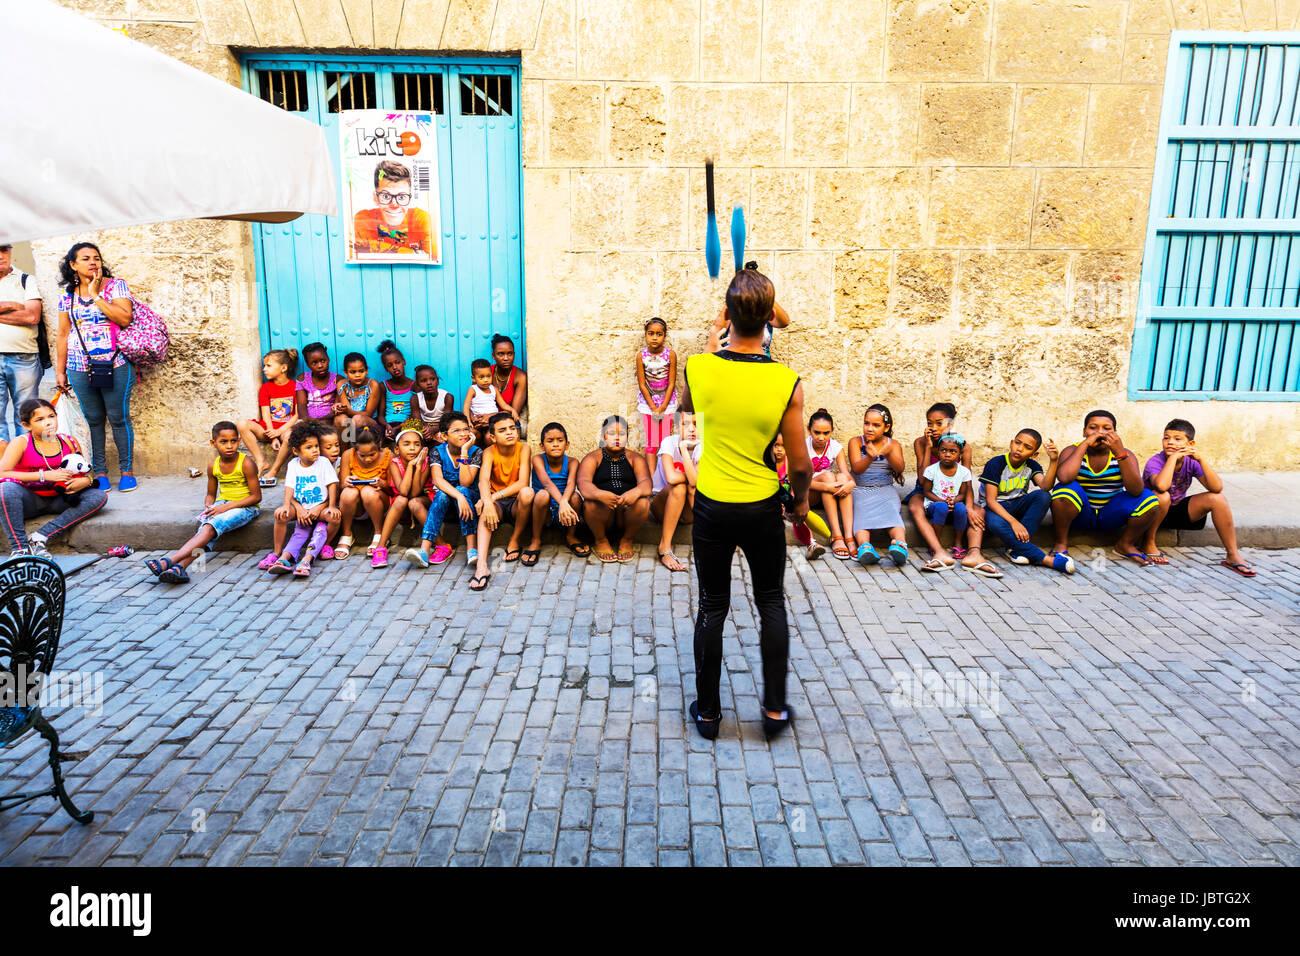 Malabarista entretenido kids, malabarismo, entretenimiento para niños, entretenimiento para los niños, entretenimiento Foto de stock